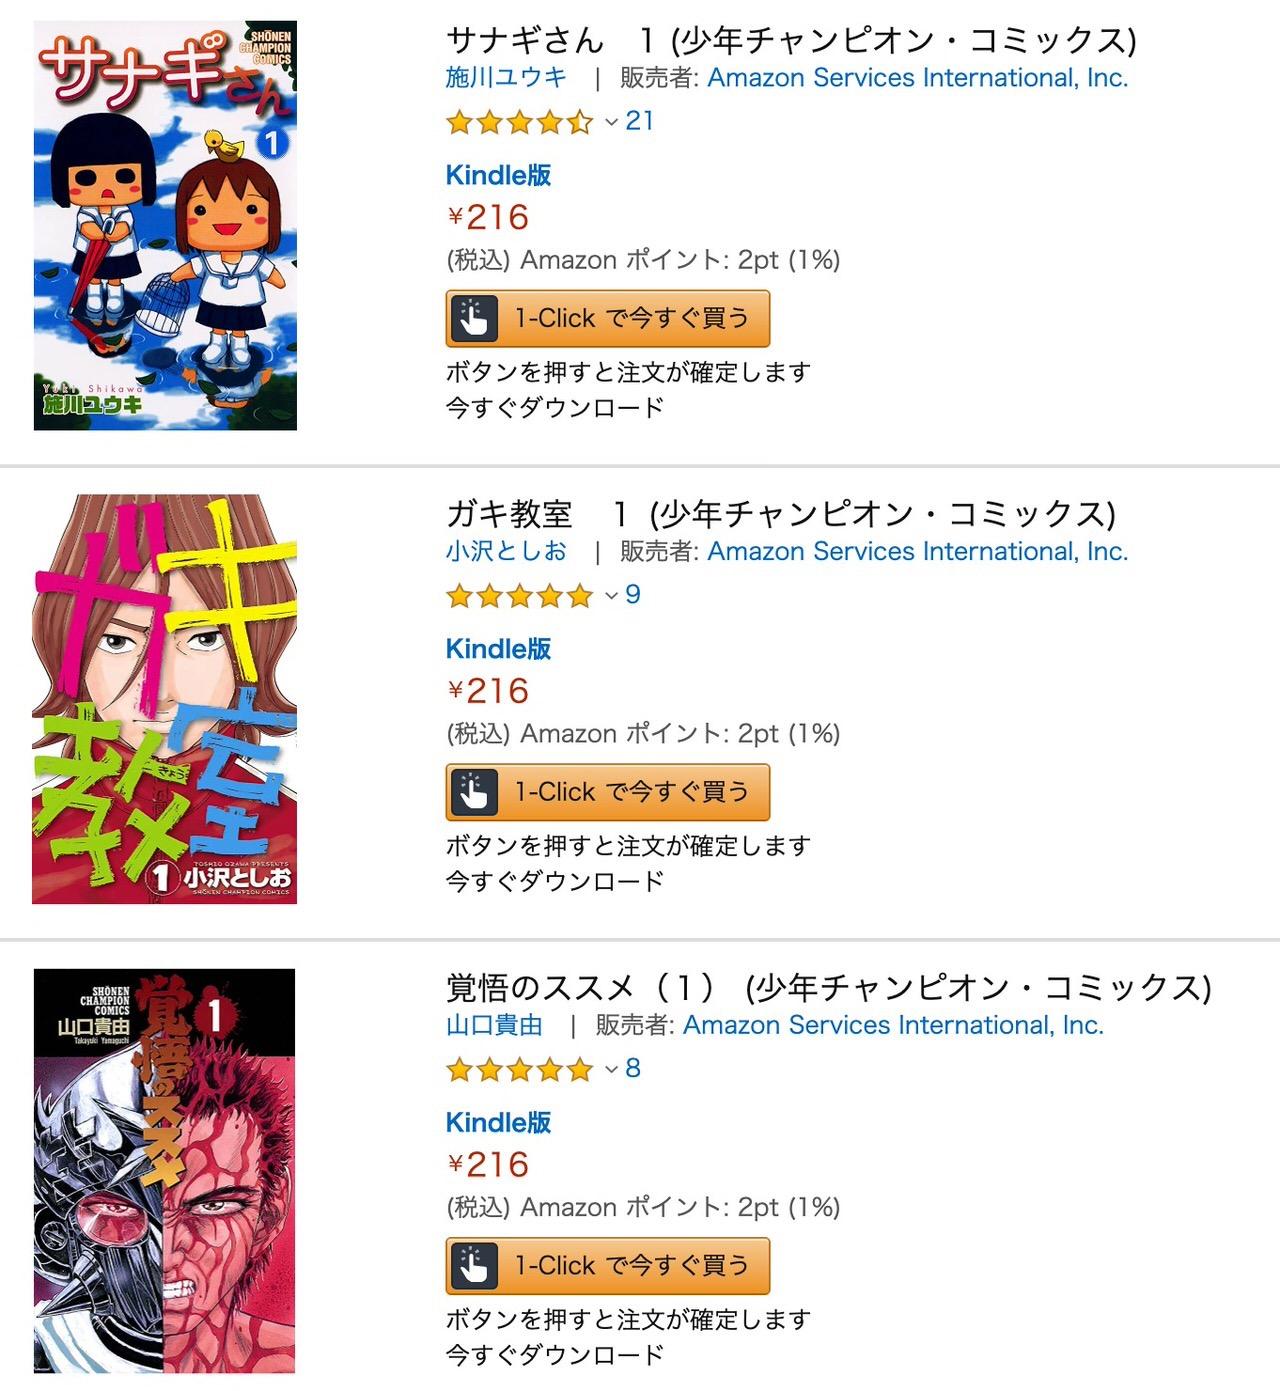 【Kindleセール】週刊少年チャンピオン50周年記念キャンペーン第1弾「オール完結!名作&話題作大集合!フェア」(8/14まで)